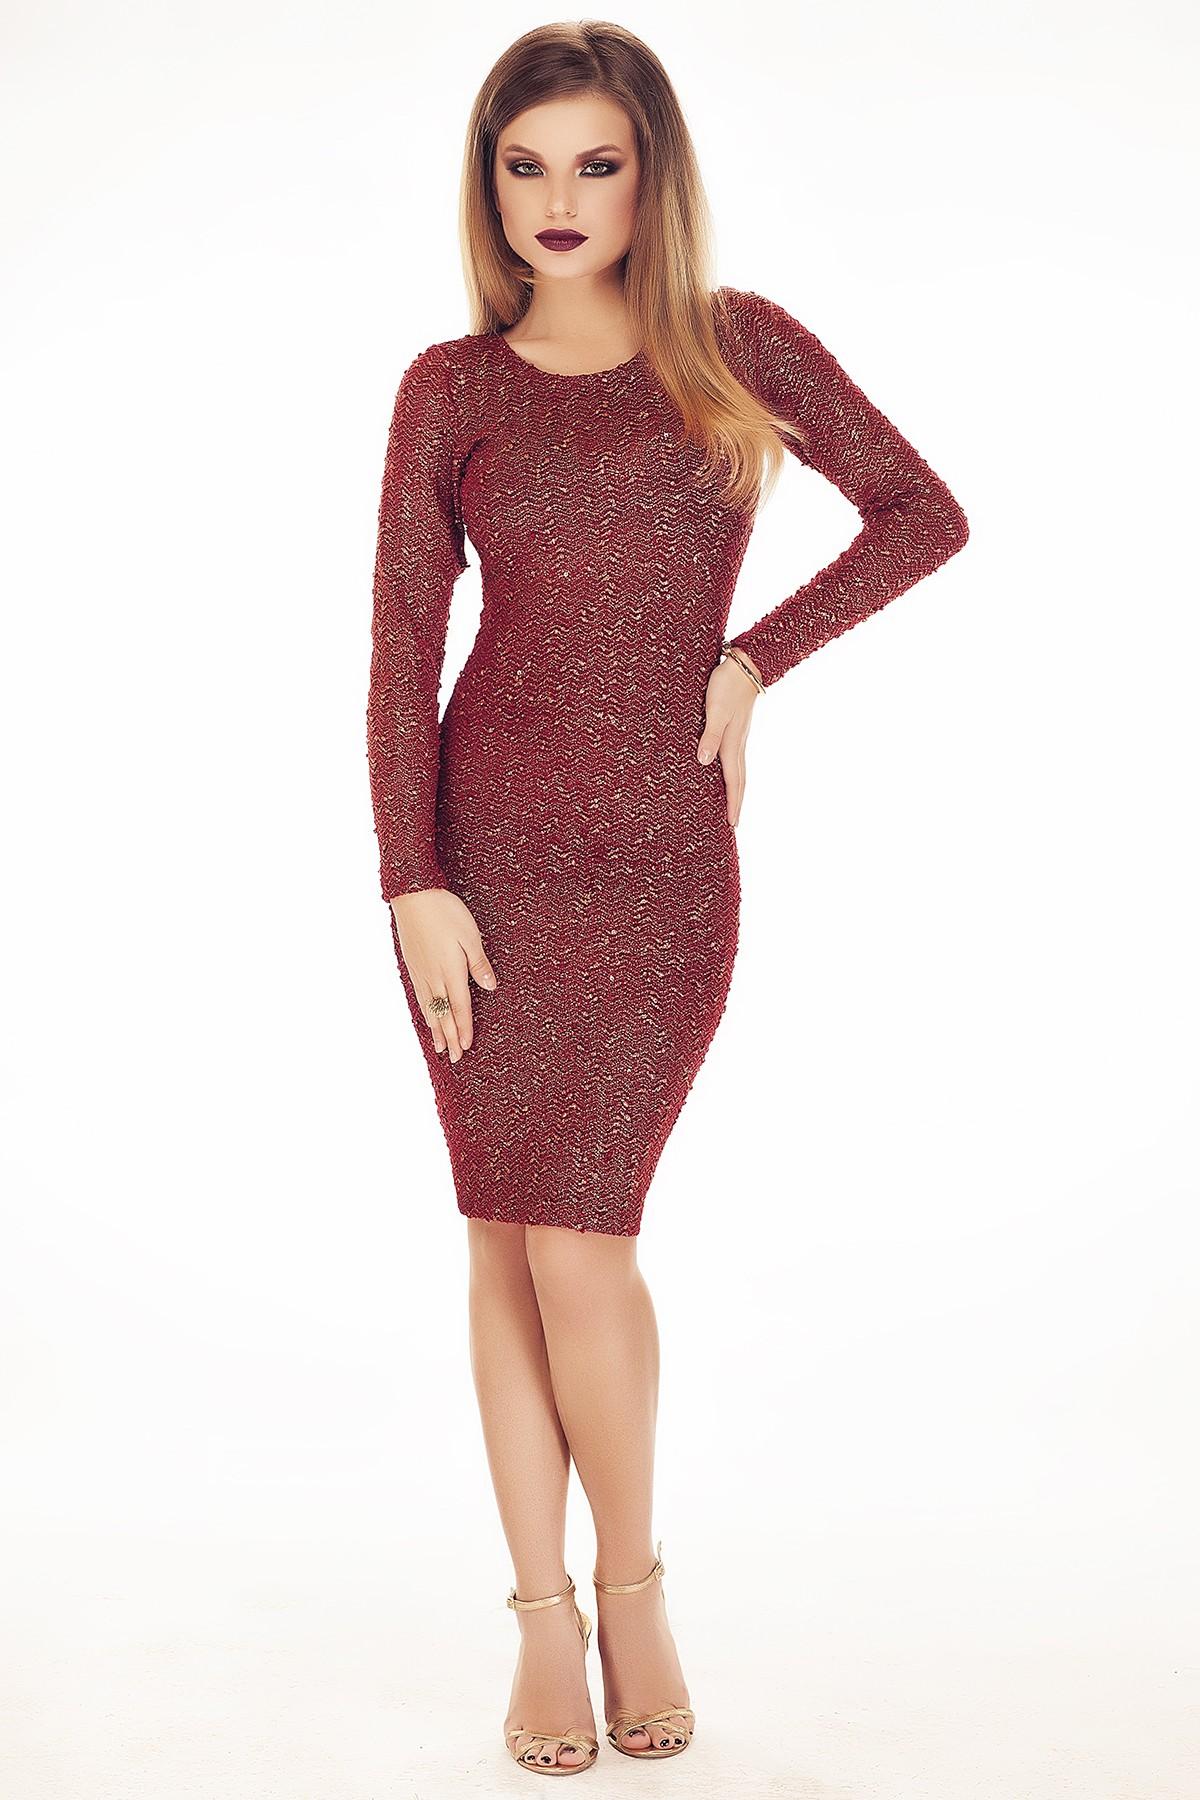 rochii de vara ieftine, rochii elegante, rochii de seara, rochii de ocazie Rochii la pret unic - 69 lei